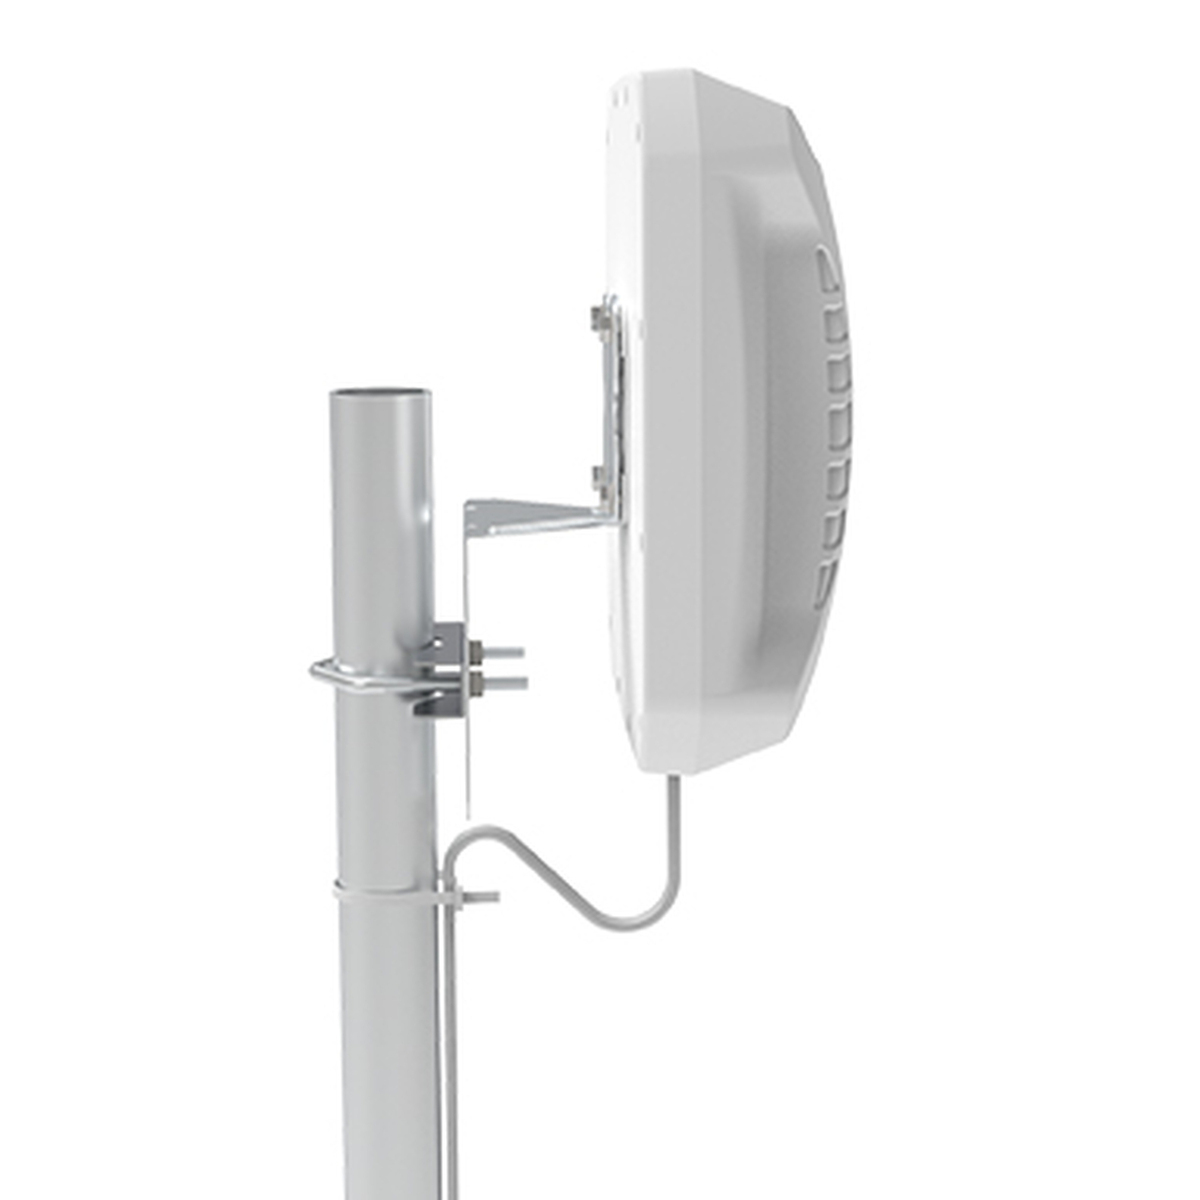 The Crossbow 5G Antenna | Bolton Technical